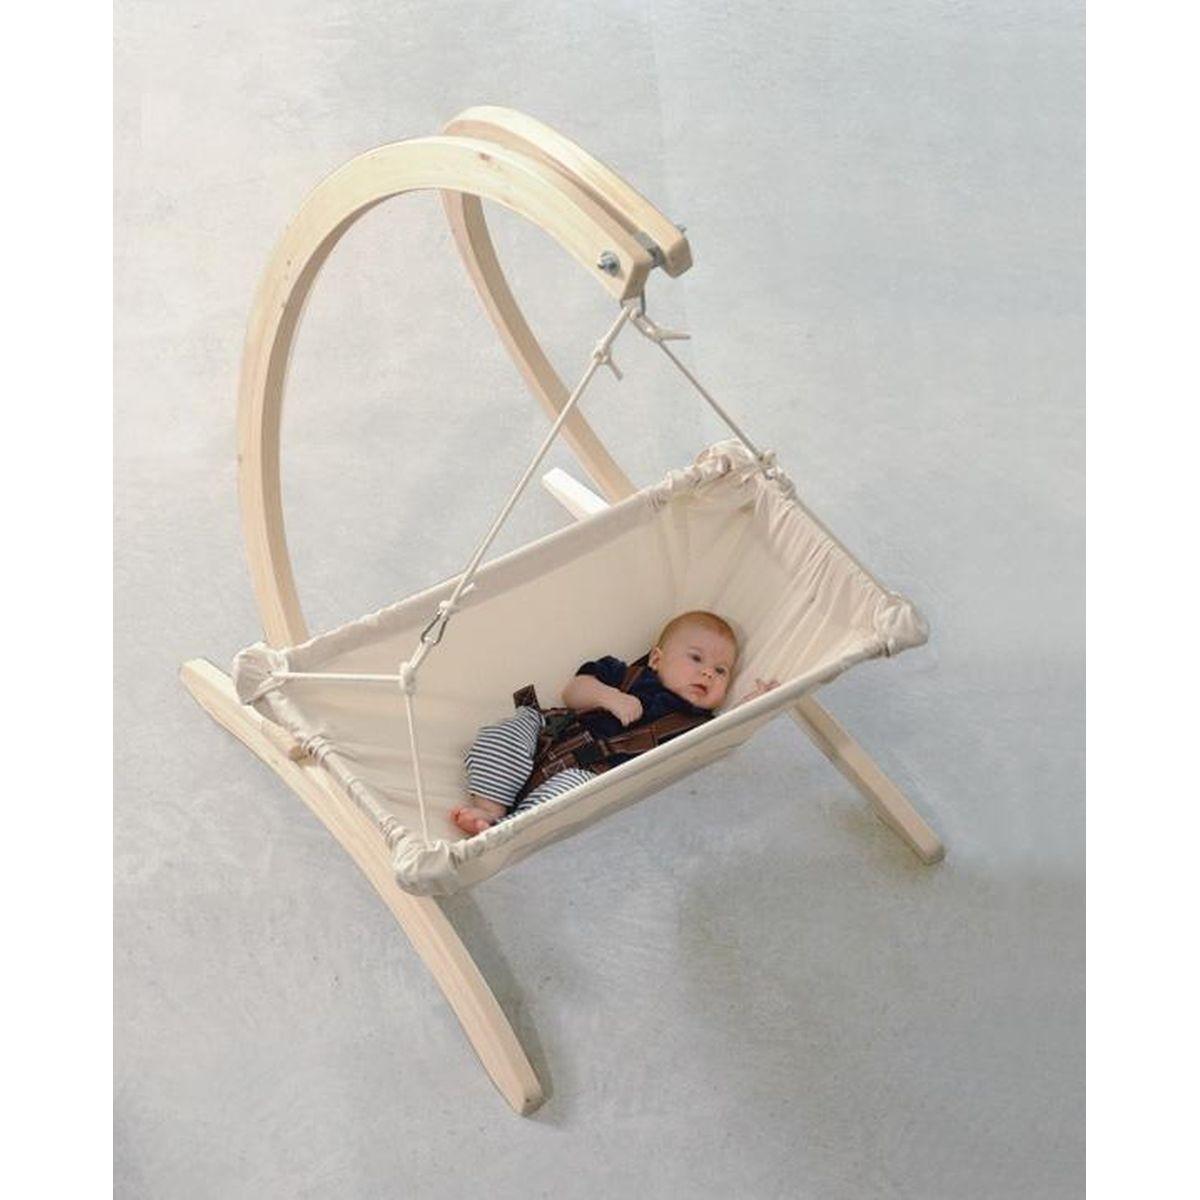 amazonas pack hamac b b kaya support carrello az 4050300 az 1010800. Black Bedroom Furniture Sets. Home Design Ideas